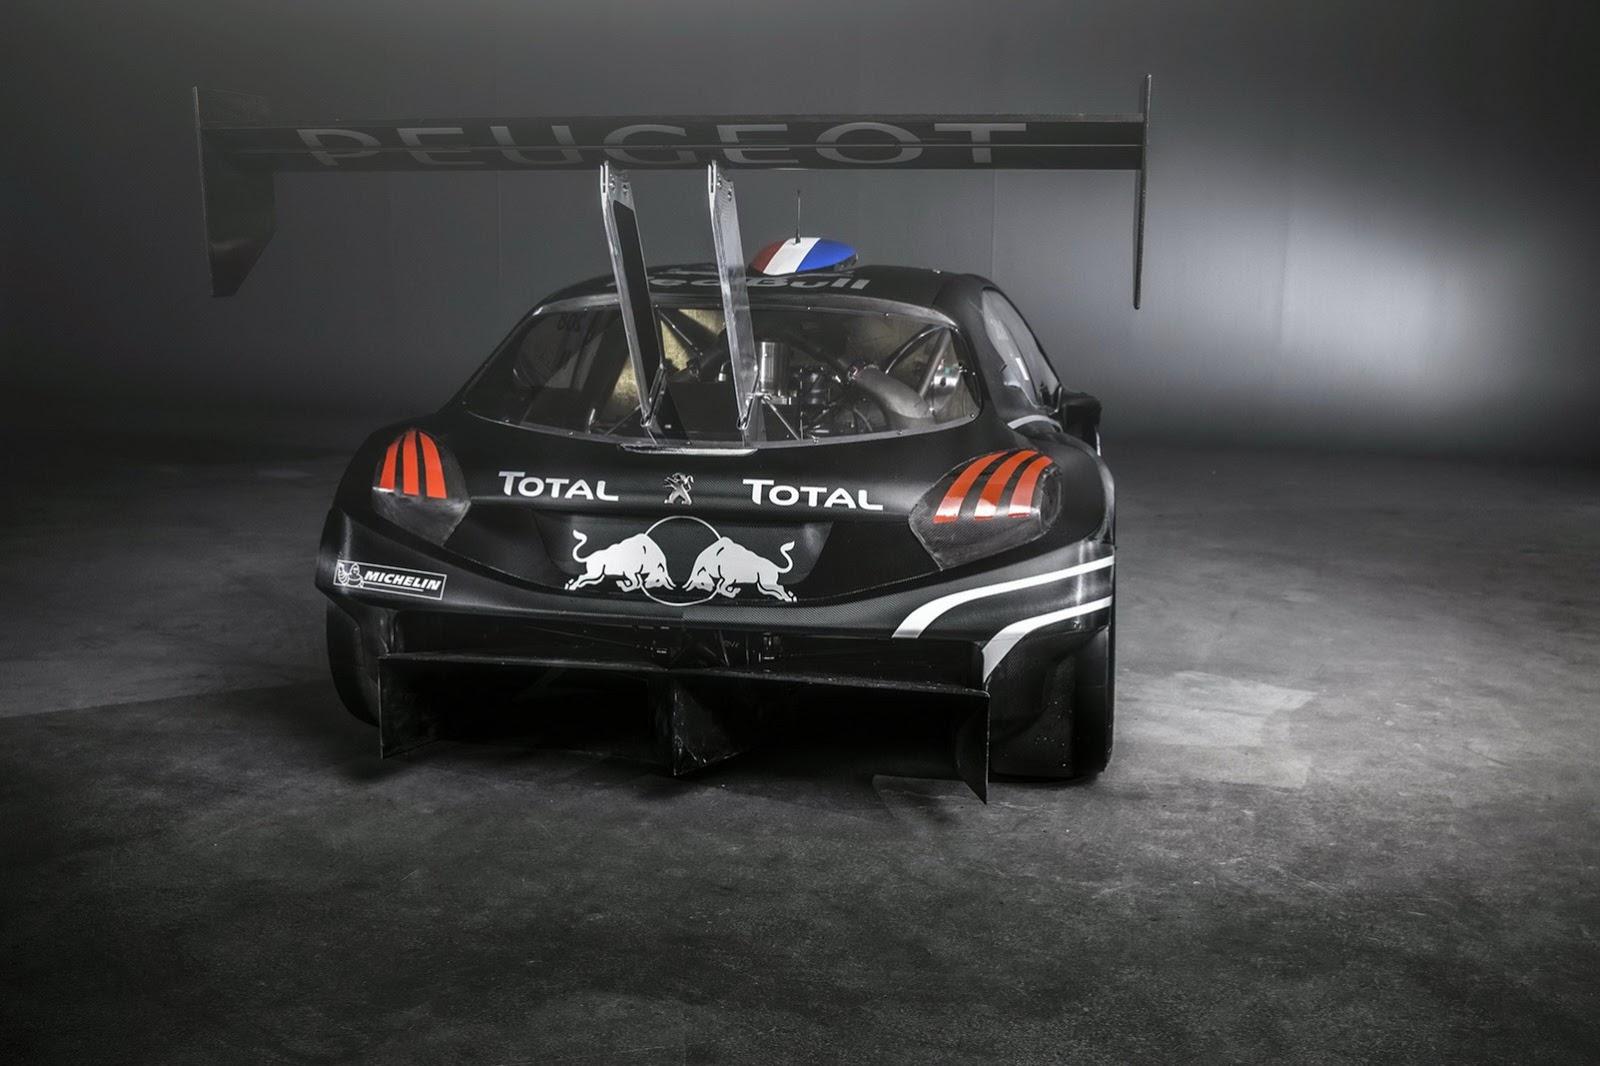 peugeot 208 t16 pikes peak race car revealed autoevolution. Black Bedroom Furniture Sets. Home Design Ideas